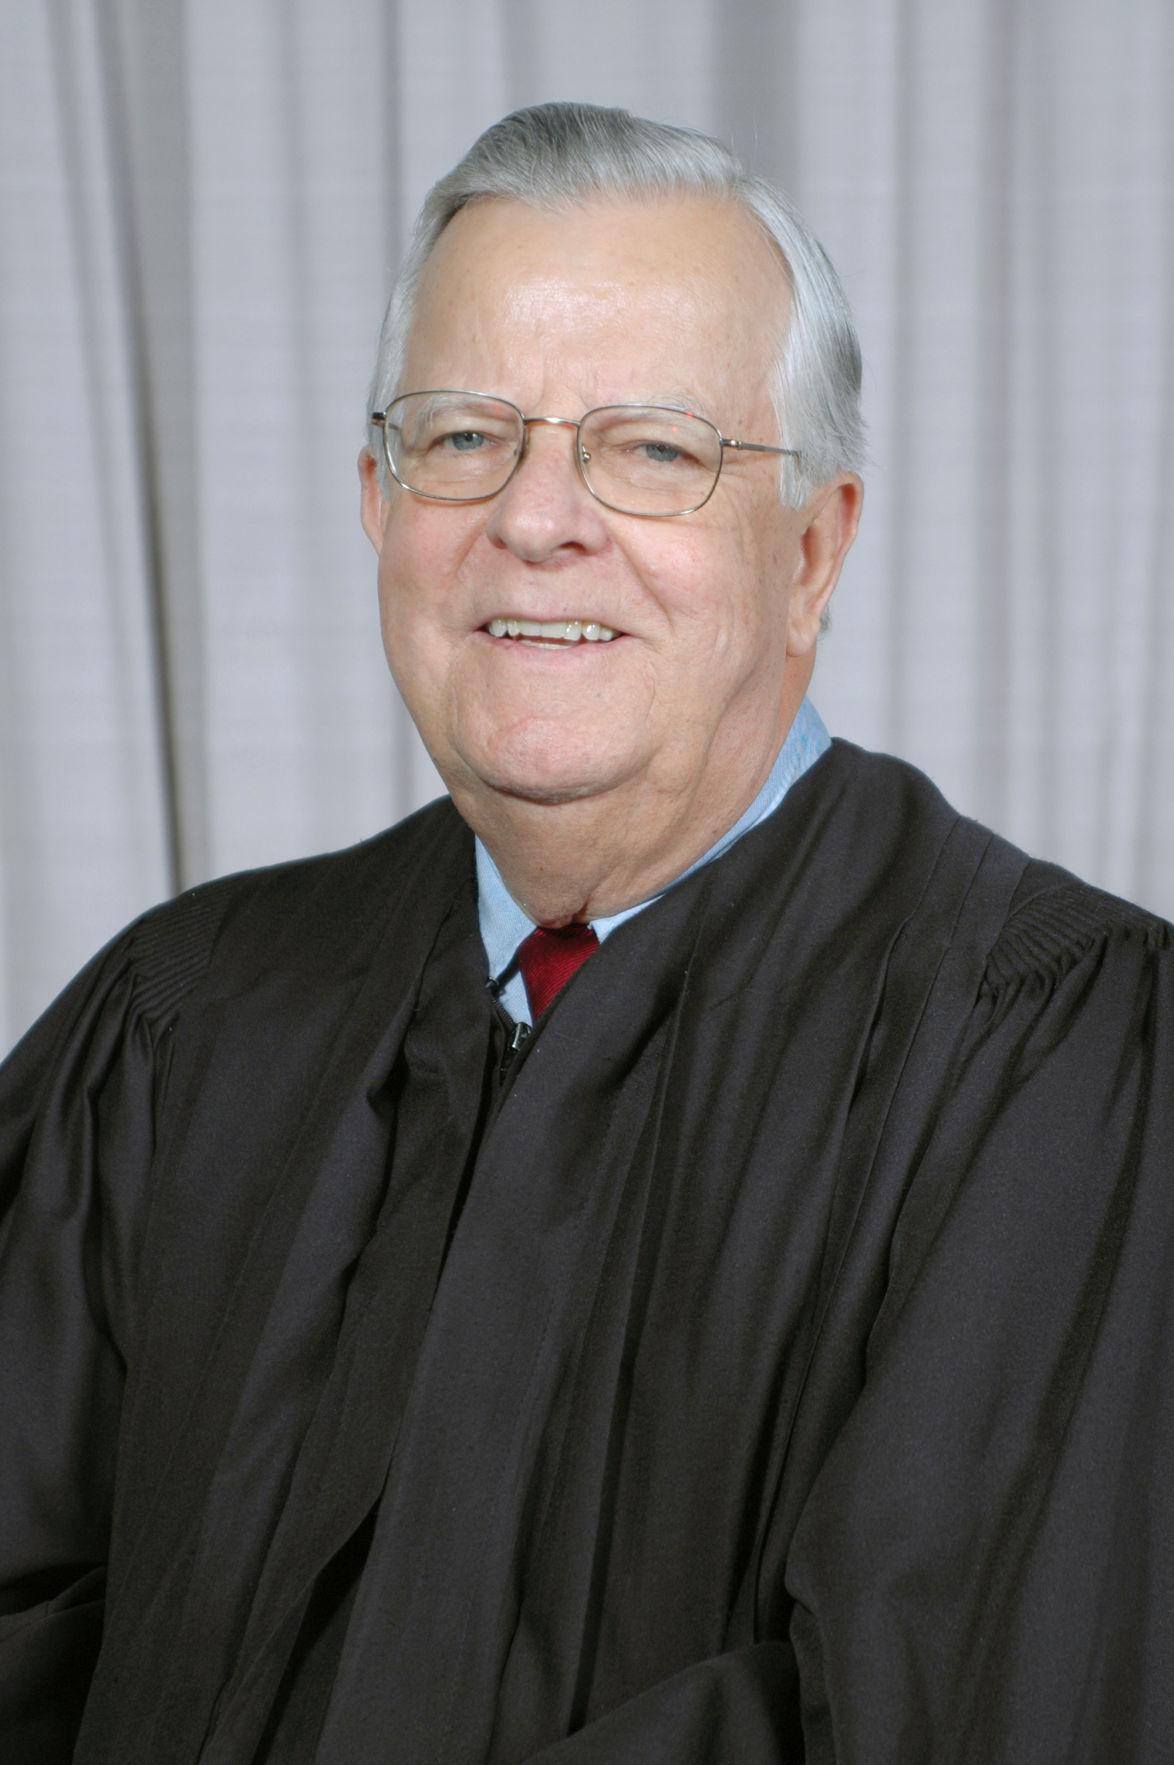 Bethel University Online >> Cobb judge denies legal challenge, validates $35 million in bonds | News | mdjonline.com